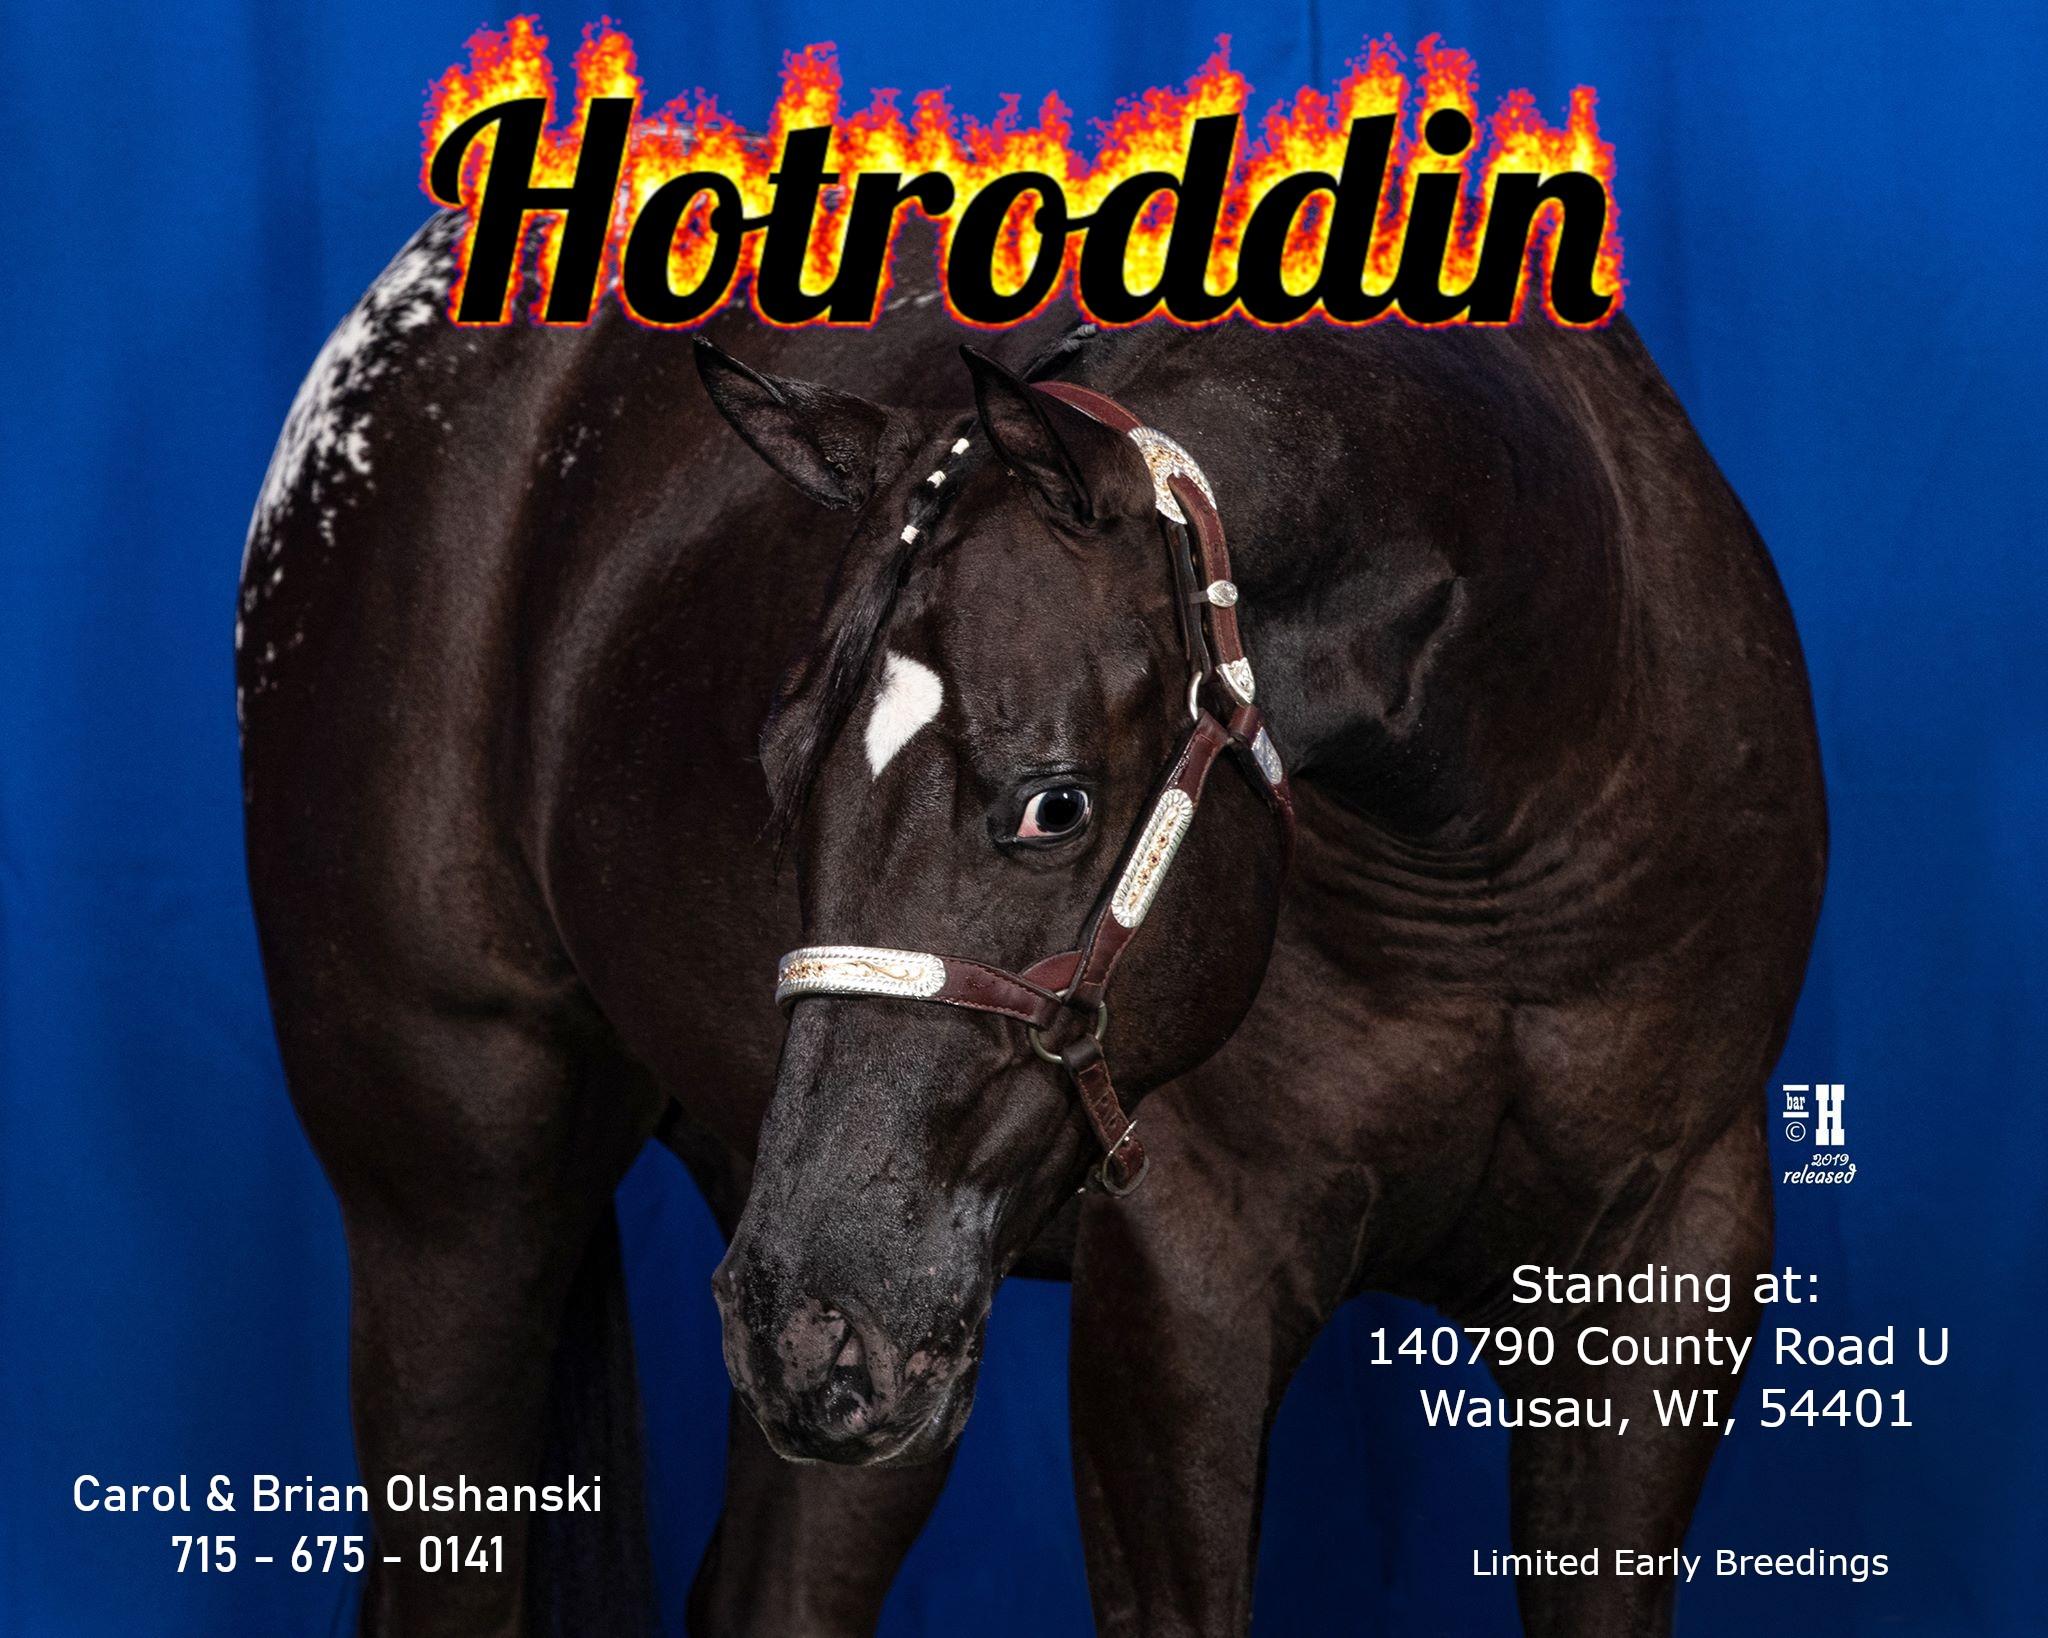 Hotroddin